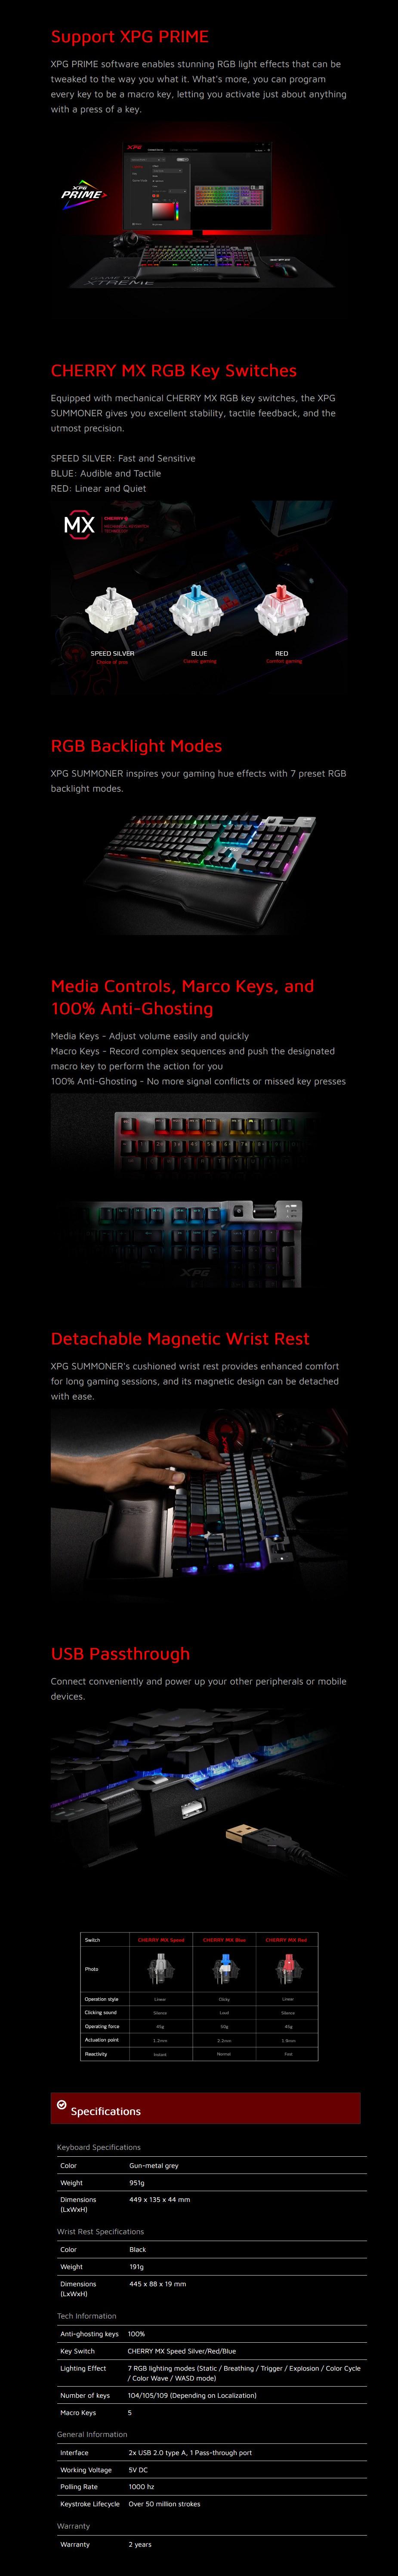 adata_xpg_summoner_rgb_mechanical_gaming_keyboard_cherry_mx_red_ac39381_4 (1).jpg